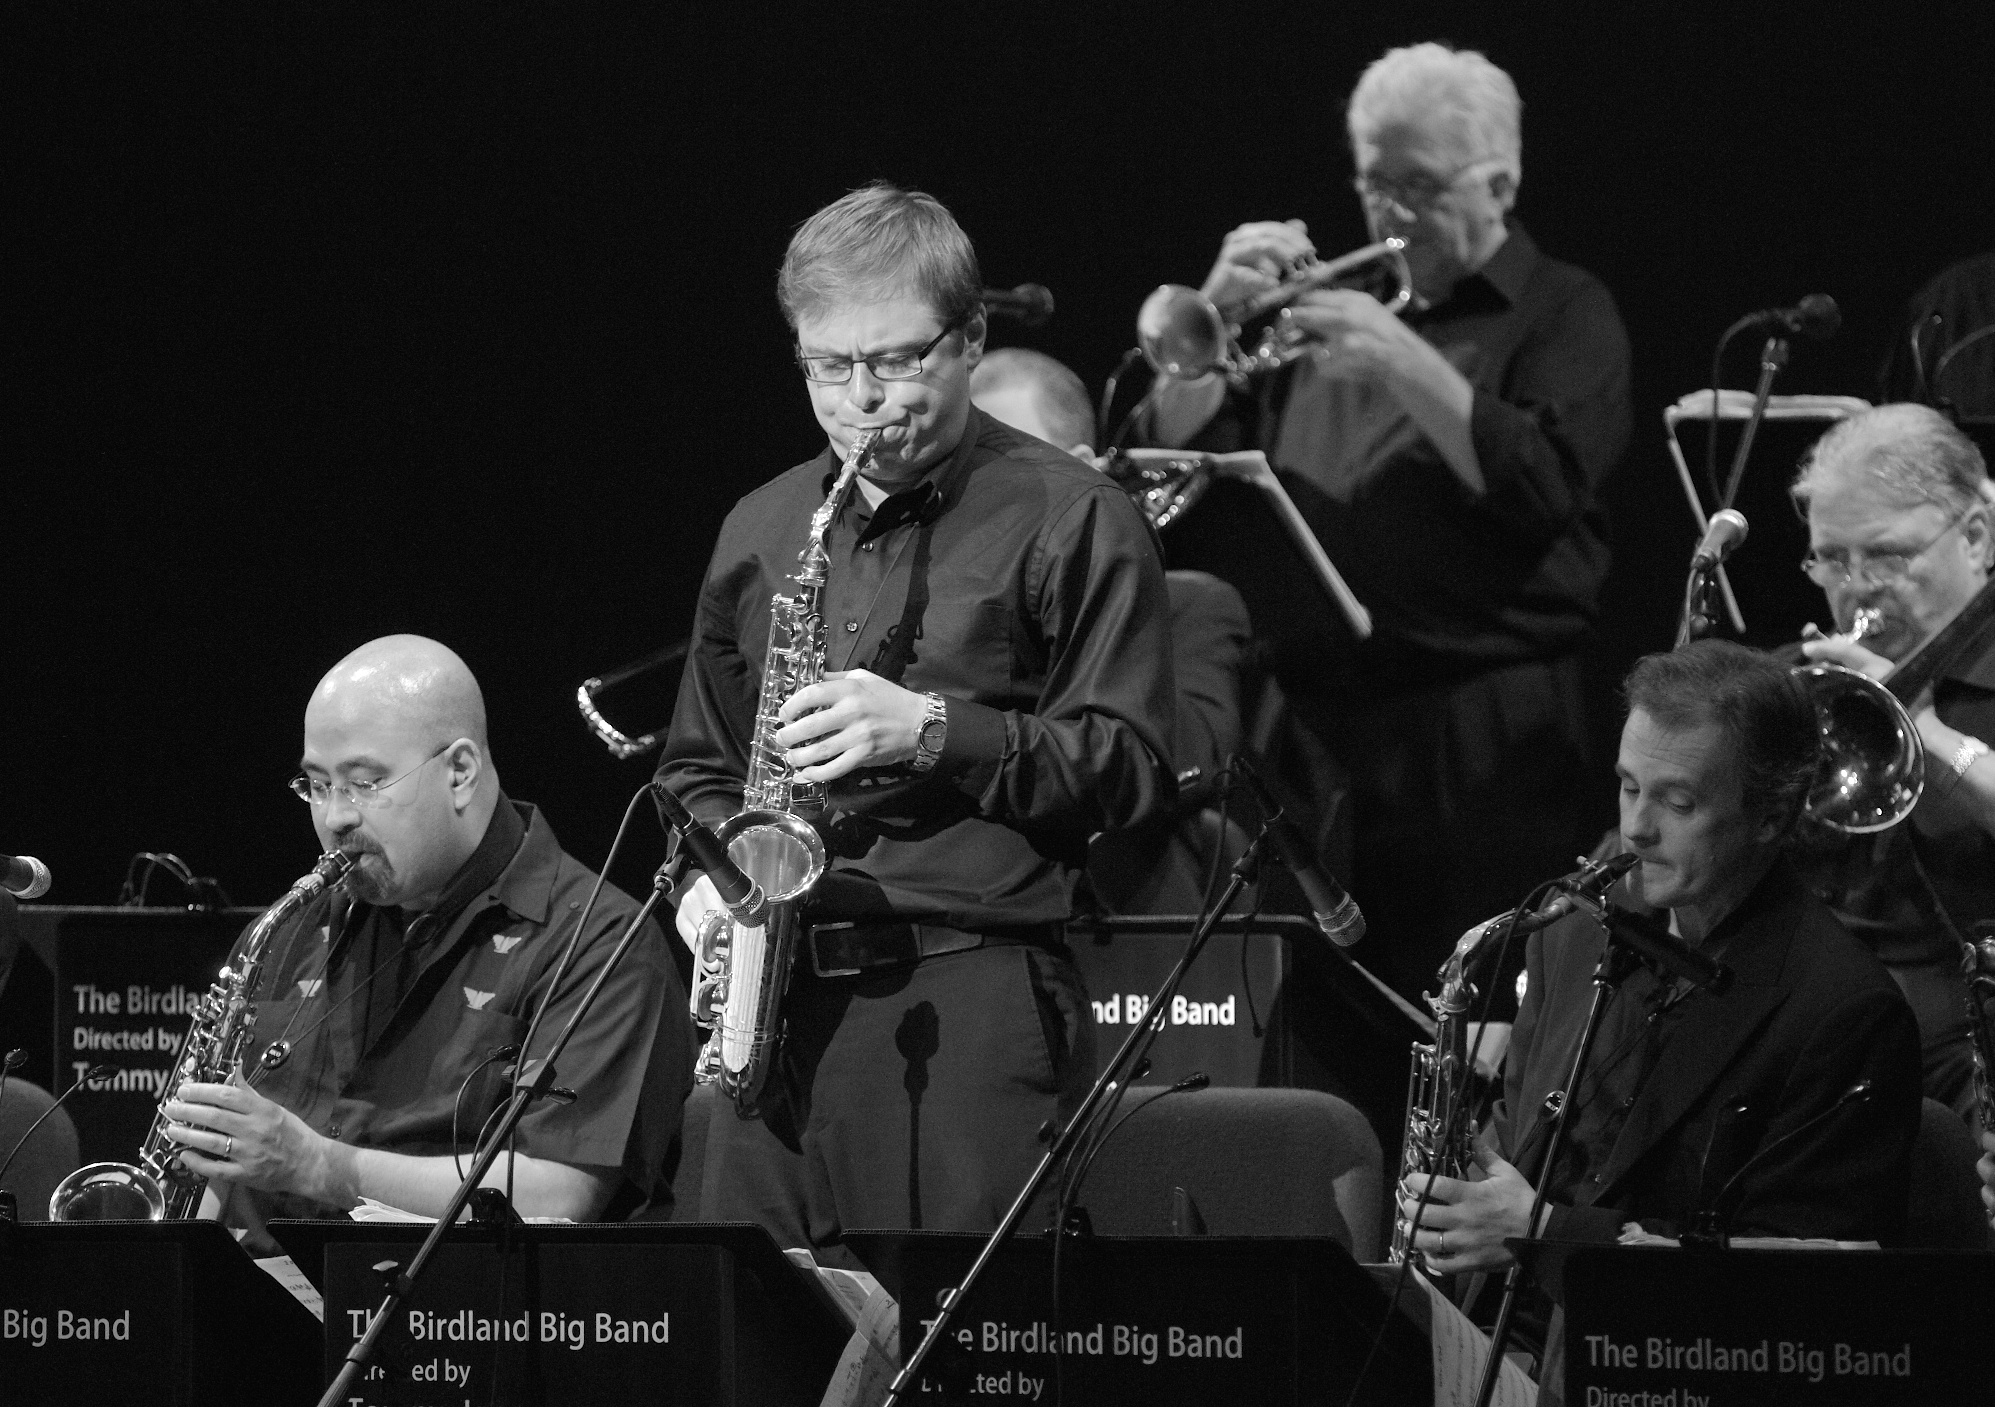 Tommy Igoe & the Birdland Big Band